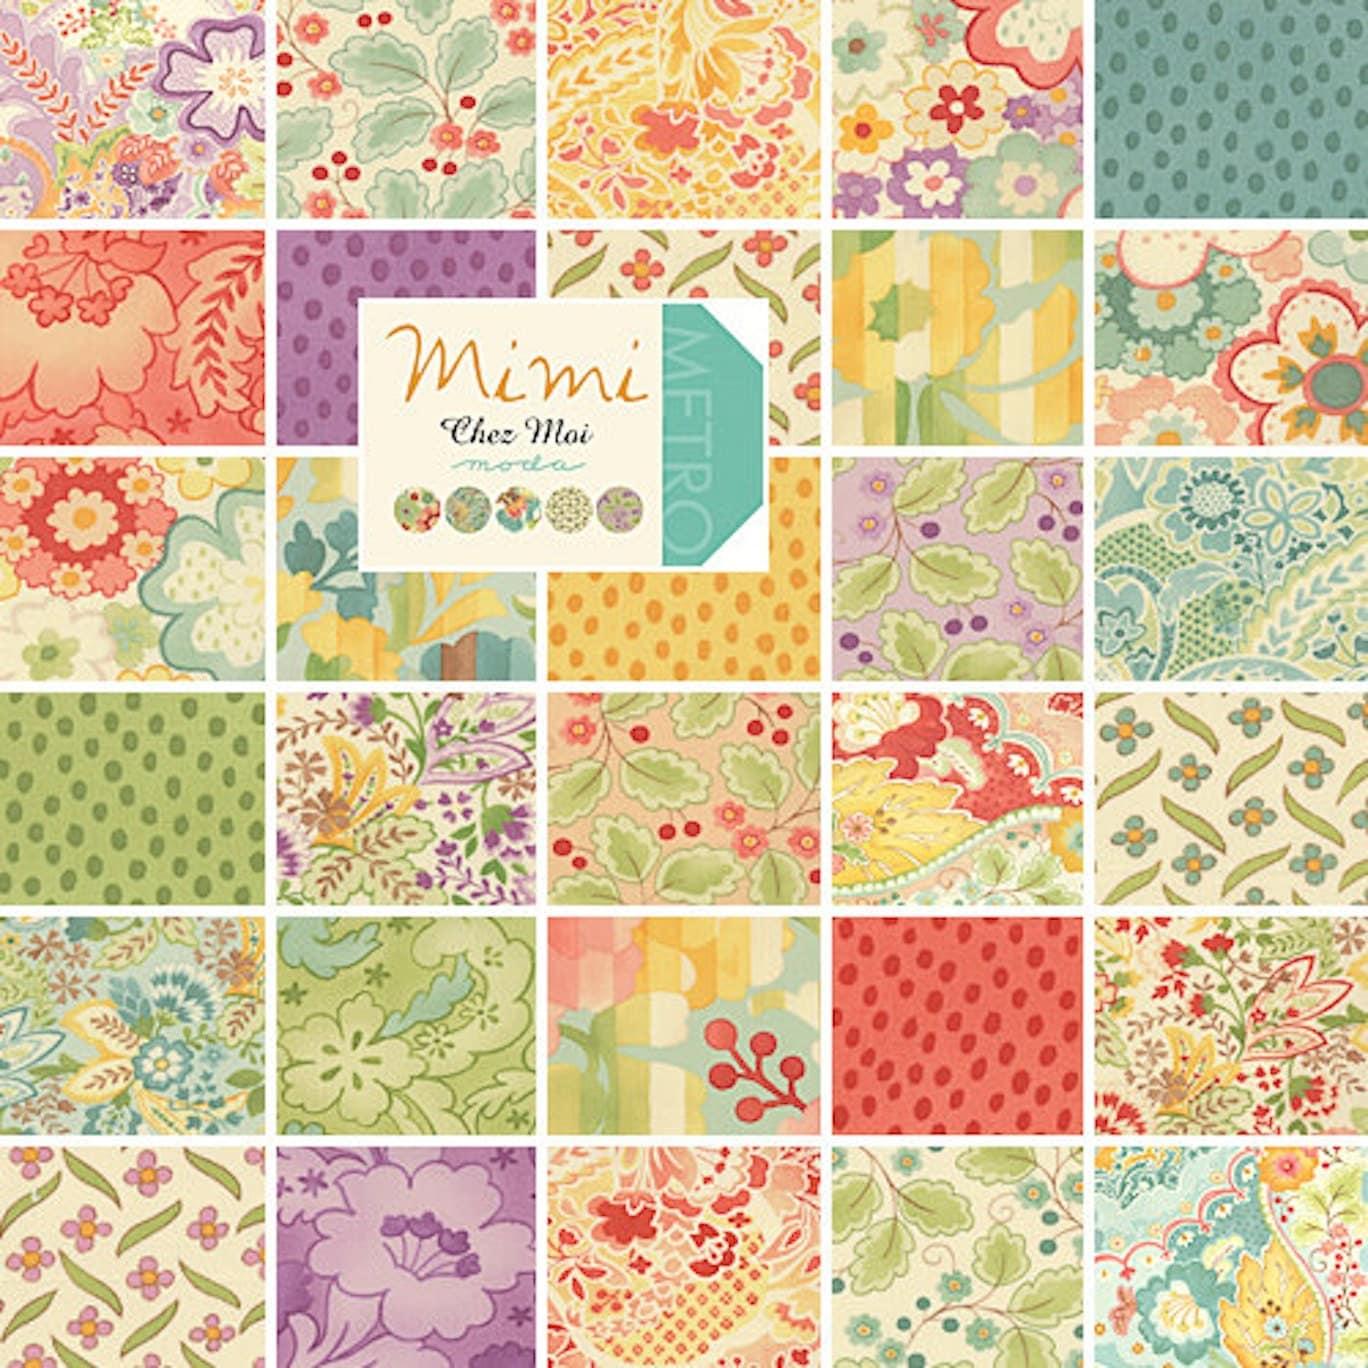 Moda Mimi Charm Pack 42 5 Squares Precut Fabric By